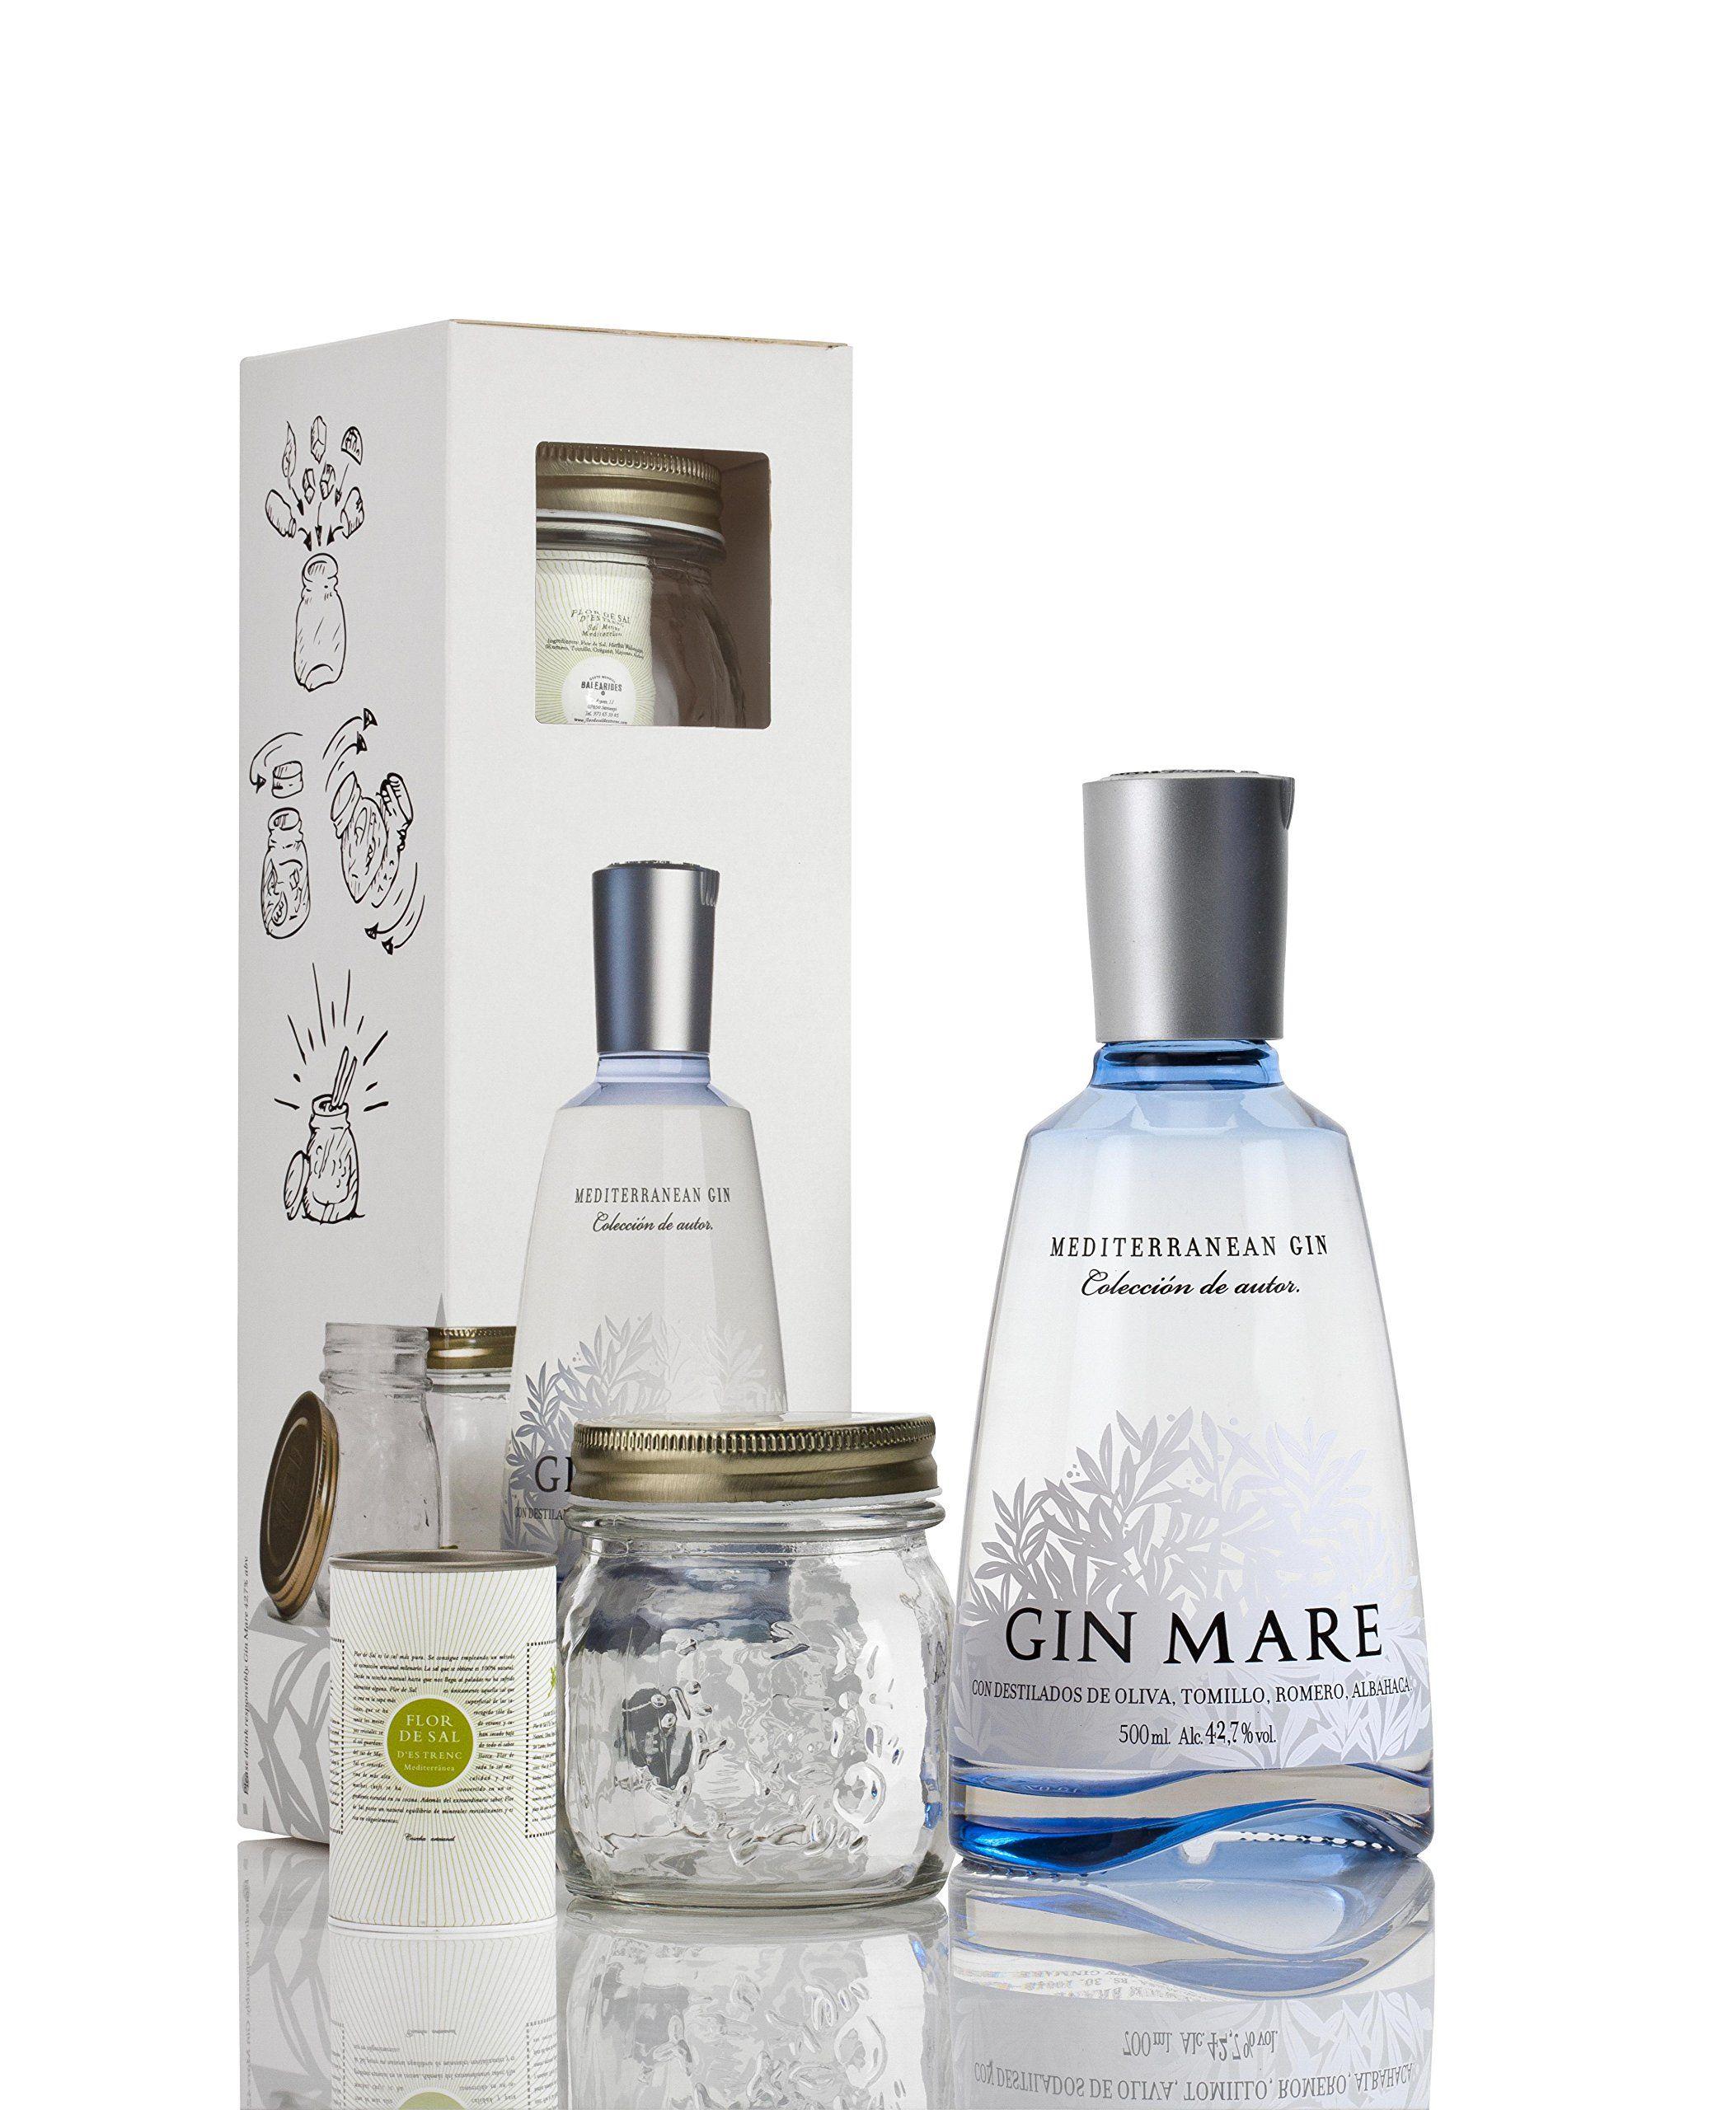 Gin mare med cocktail gift set 50 cl for Craft cocktail gift set